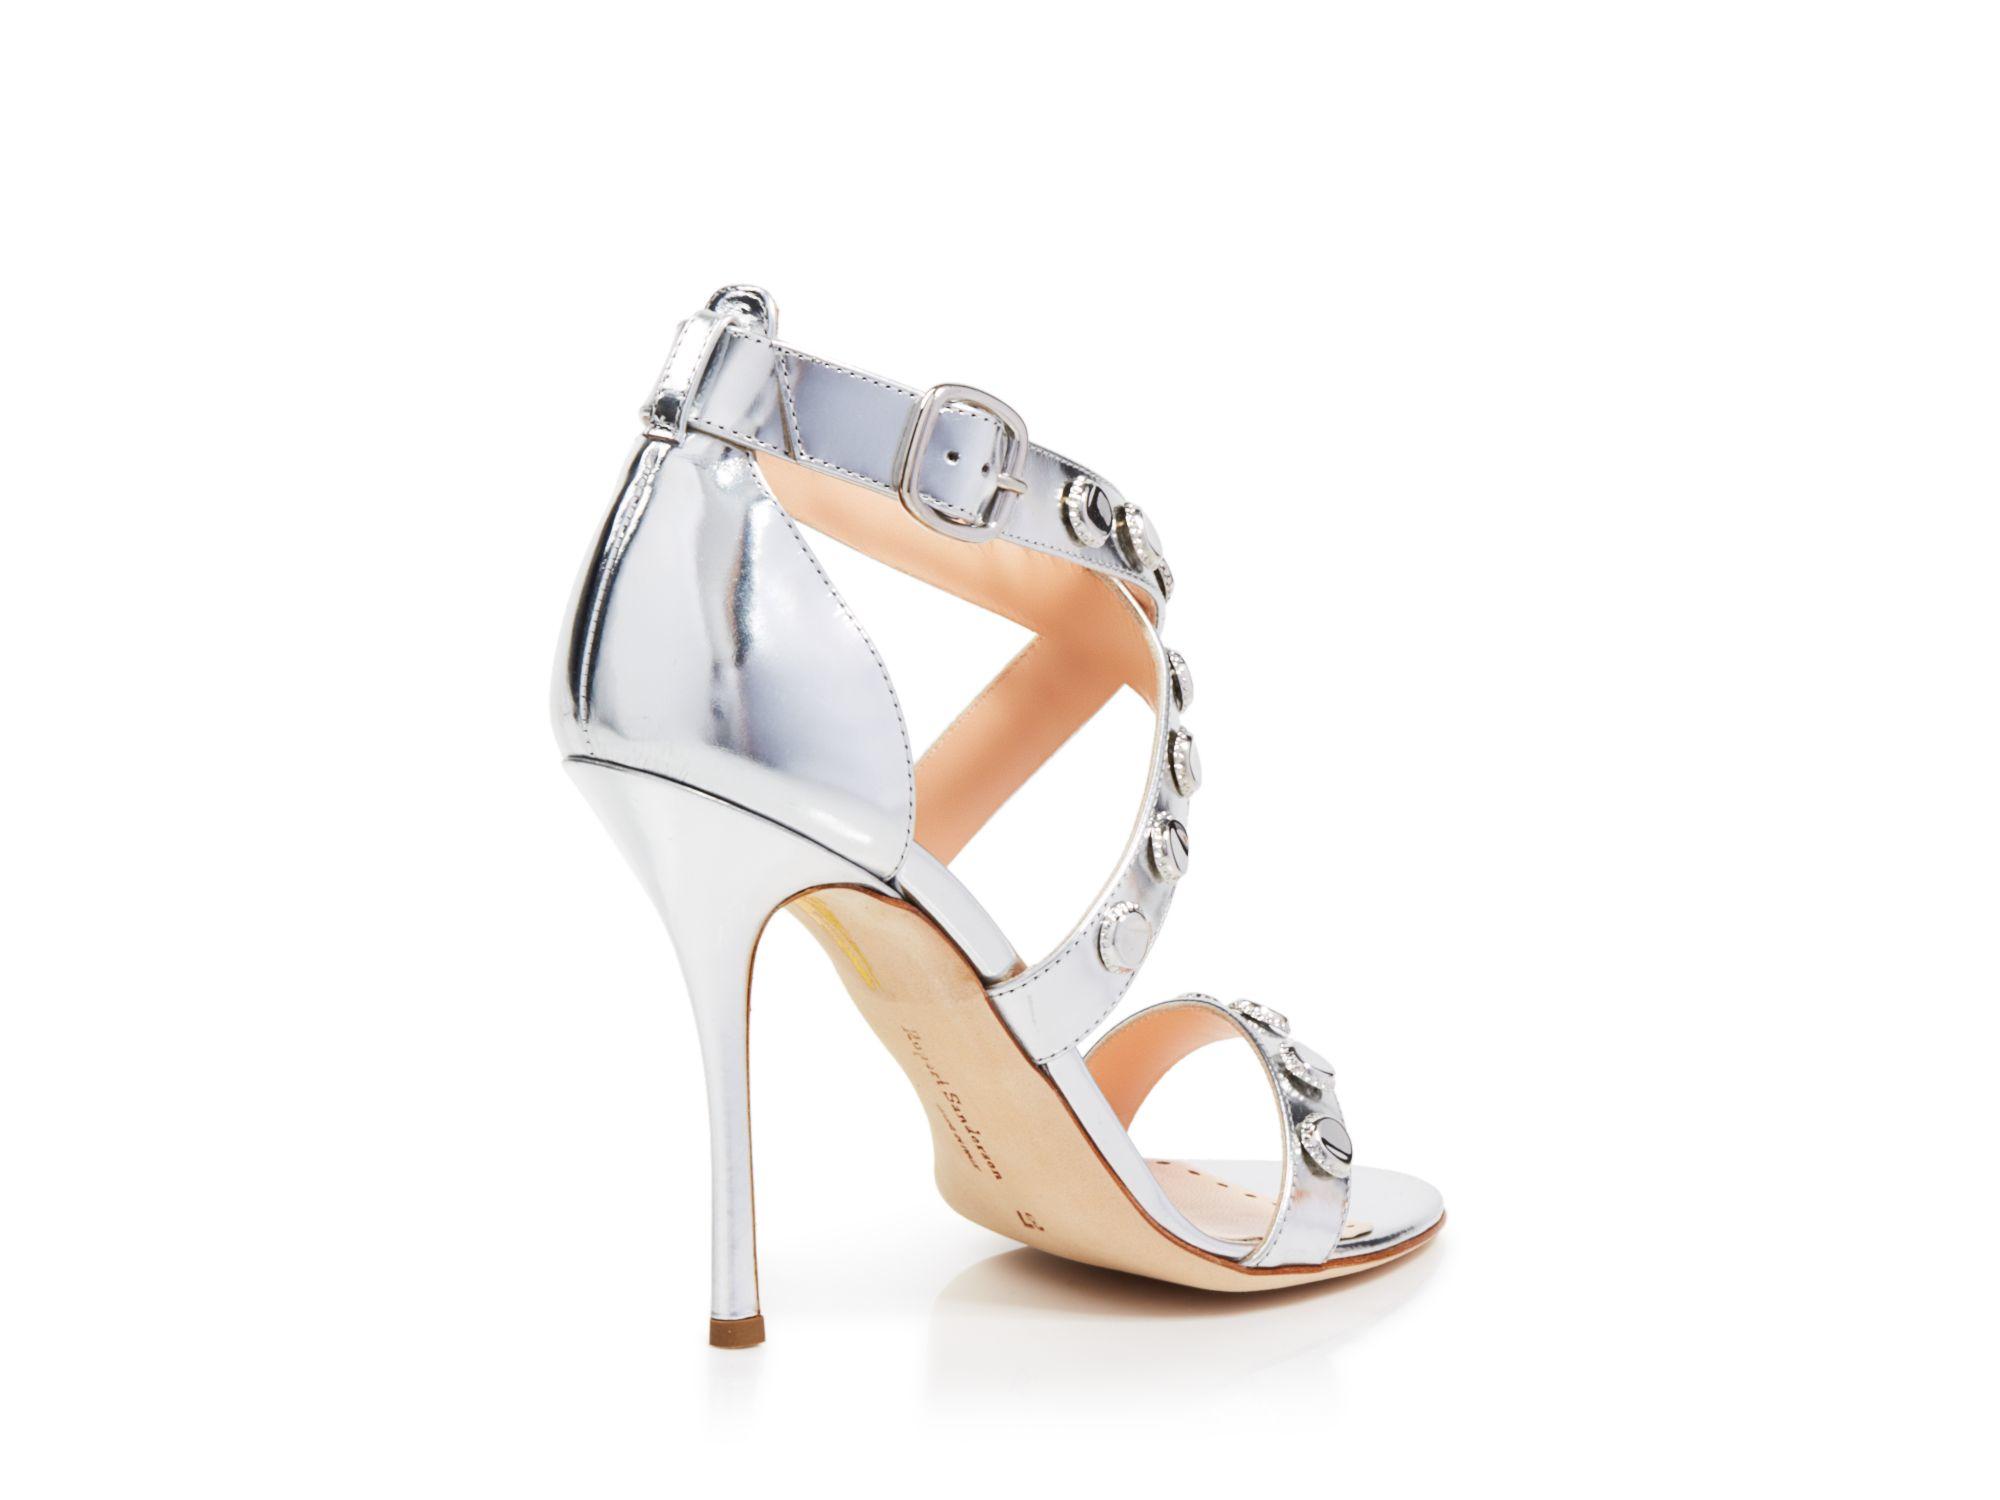 Silver Strappy Sandals High Heel